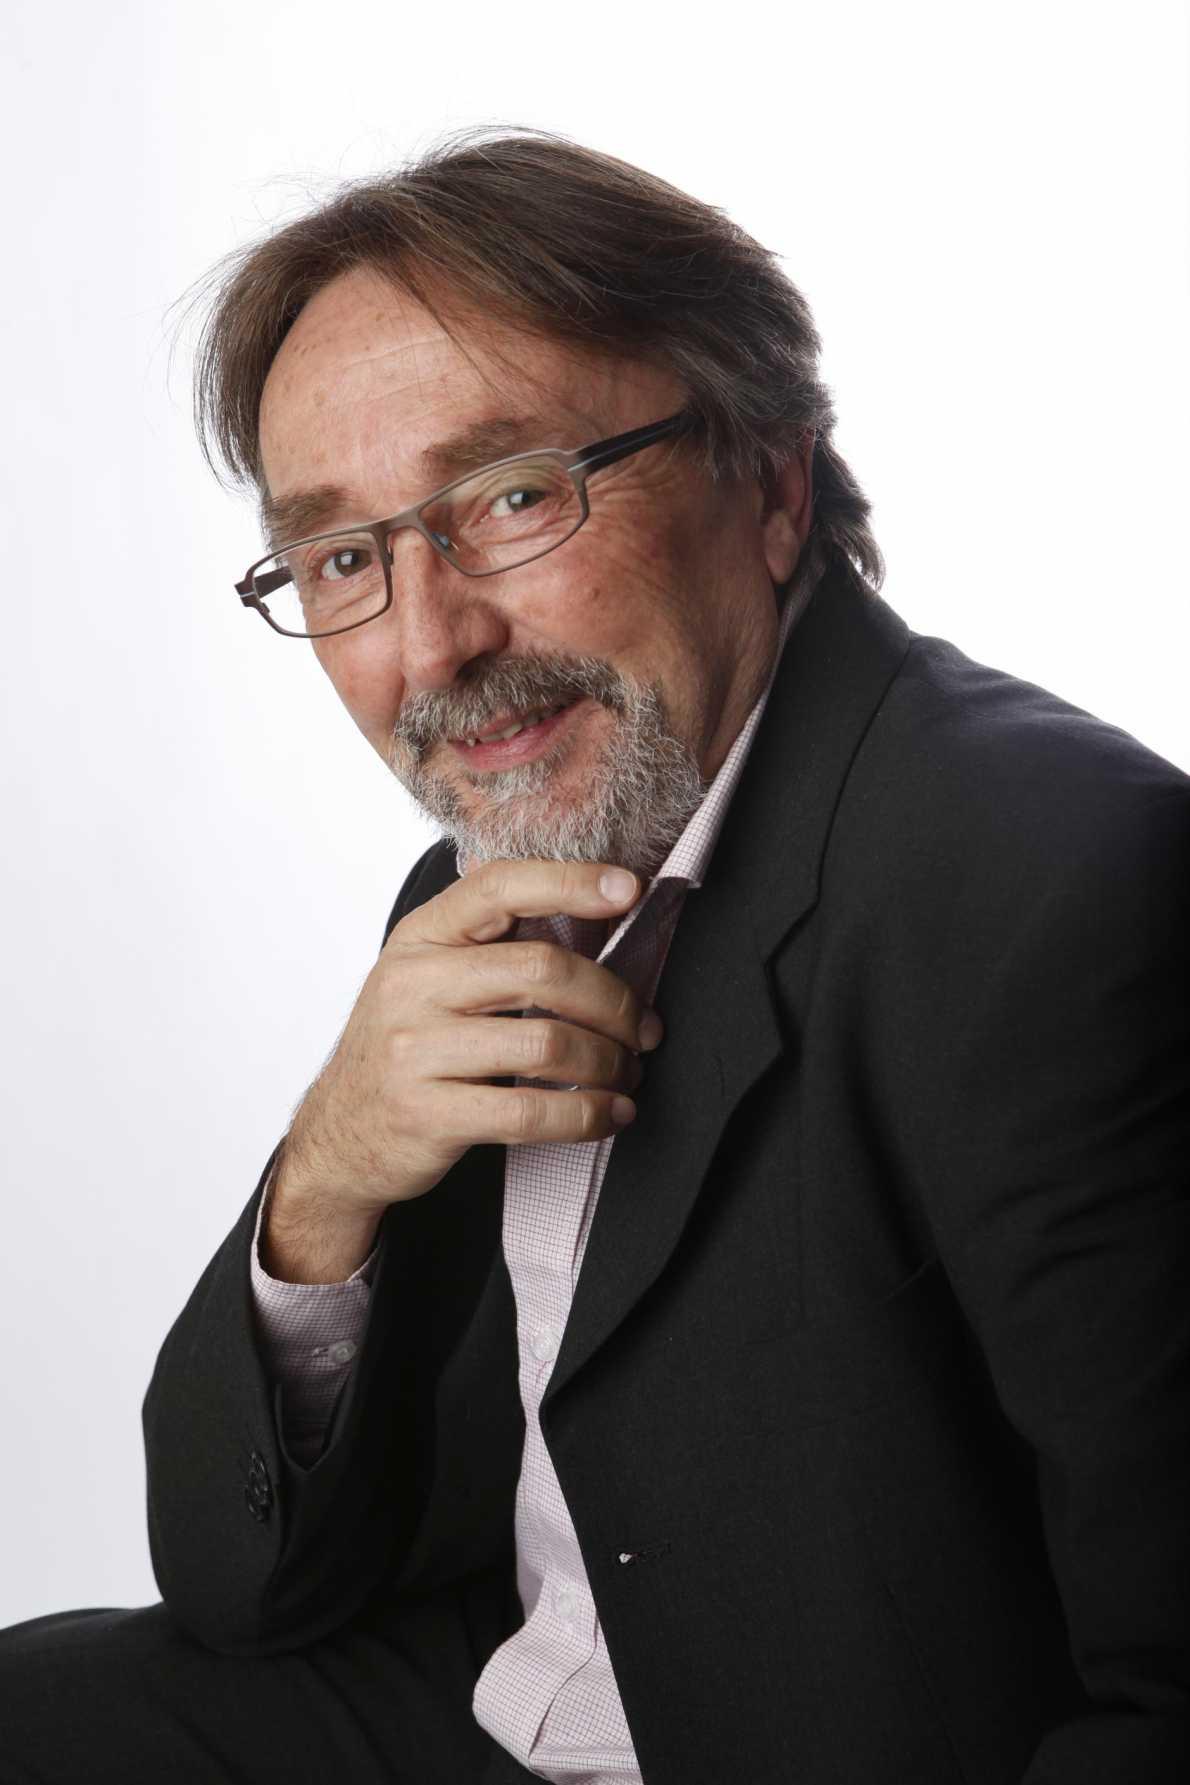 Portrait : Albin Diranzo, Sales manager (©annealsys.com 2016)